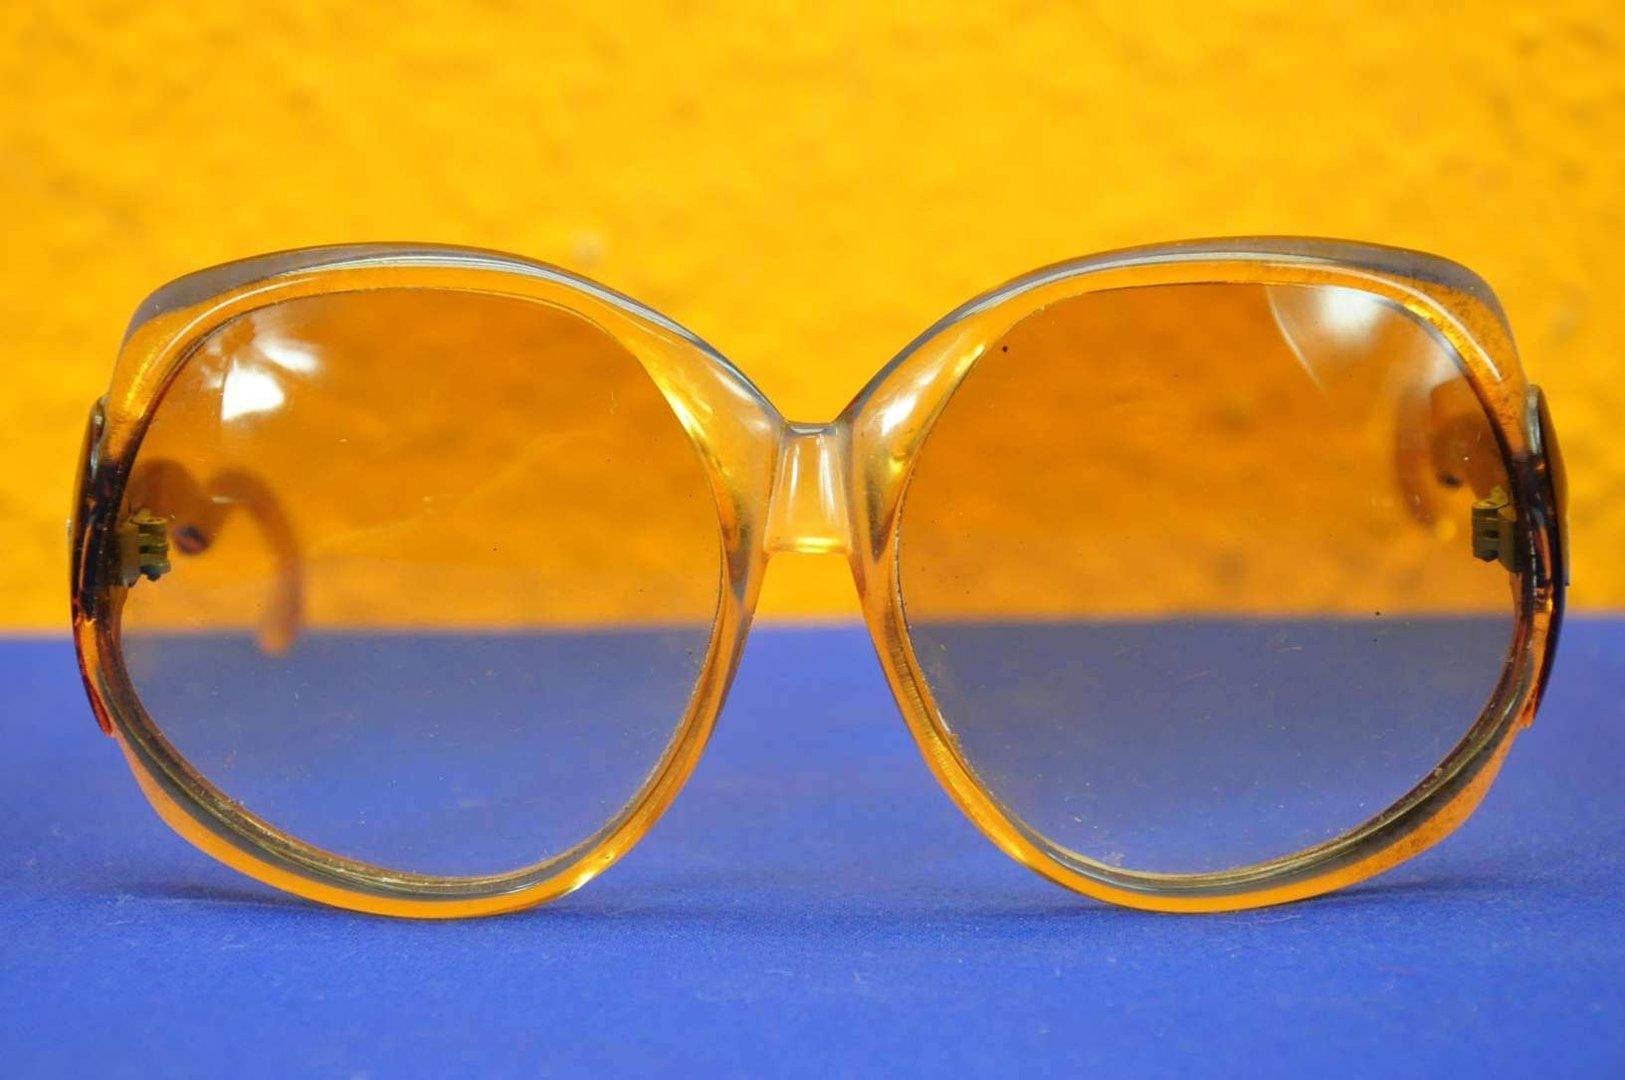 Guy Laroche Vintage Sonnenbrille im Lederetui - bei KuSeRa kaufen